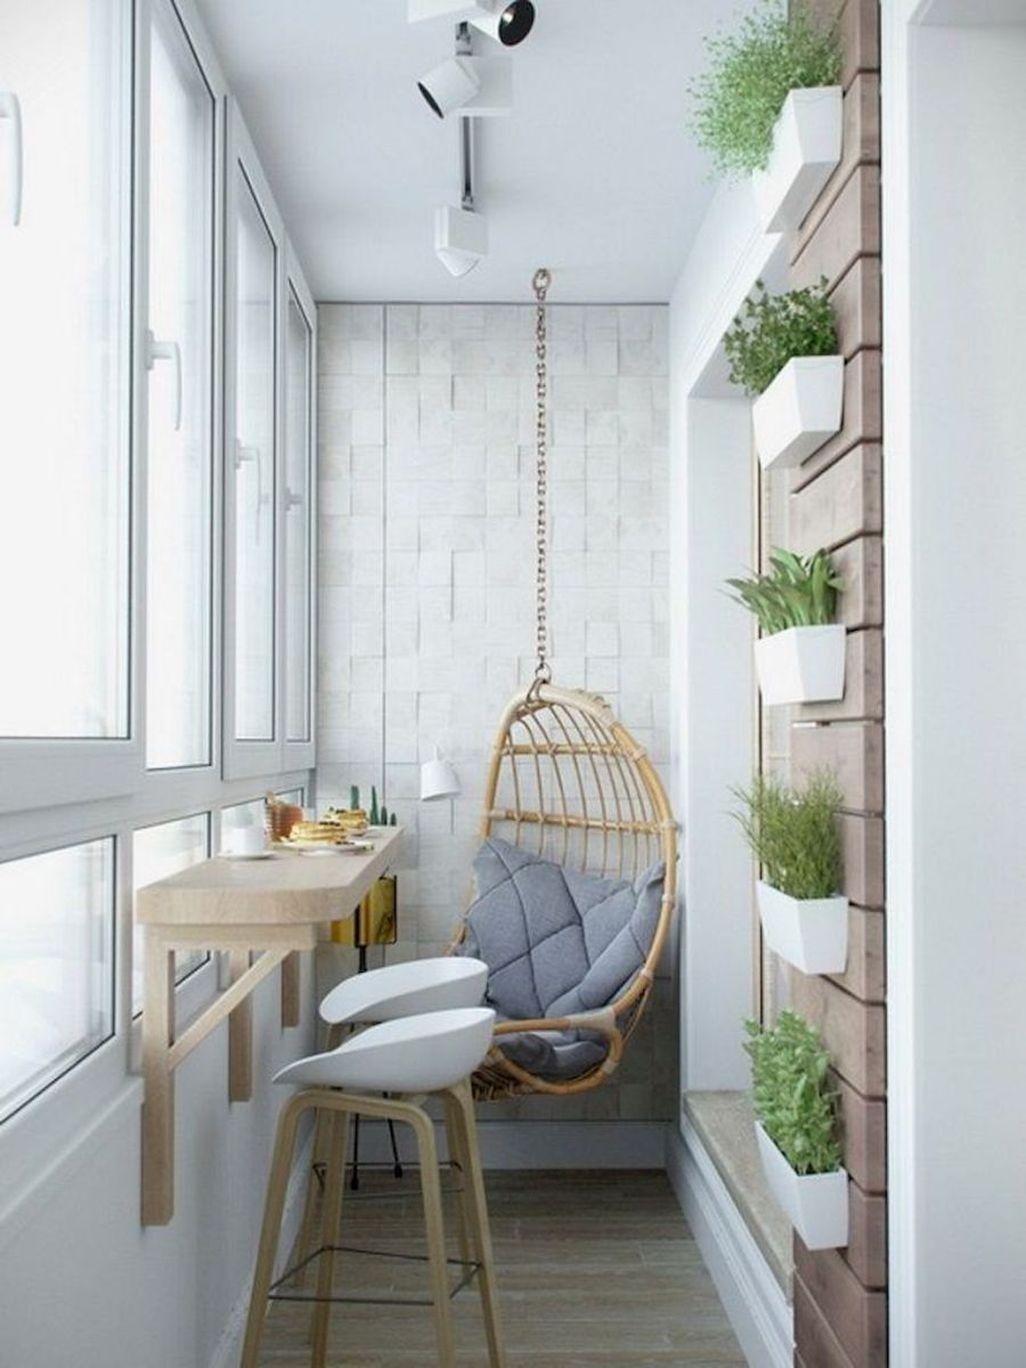 17 Elegant and Cozy Balcony Ideas balcony #17 #elegant #and #cozy